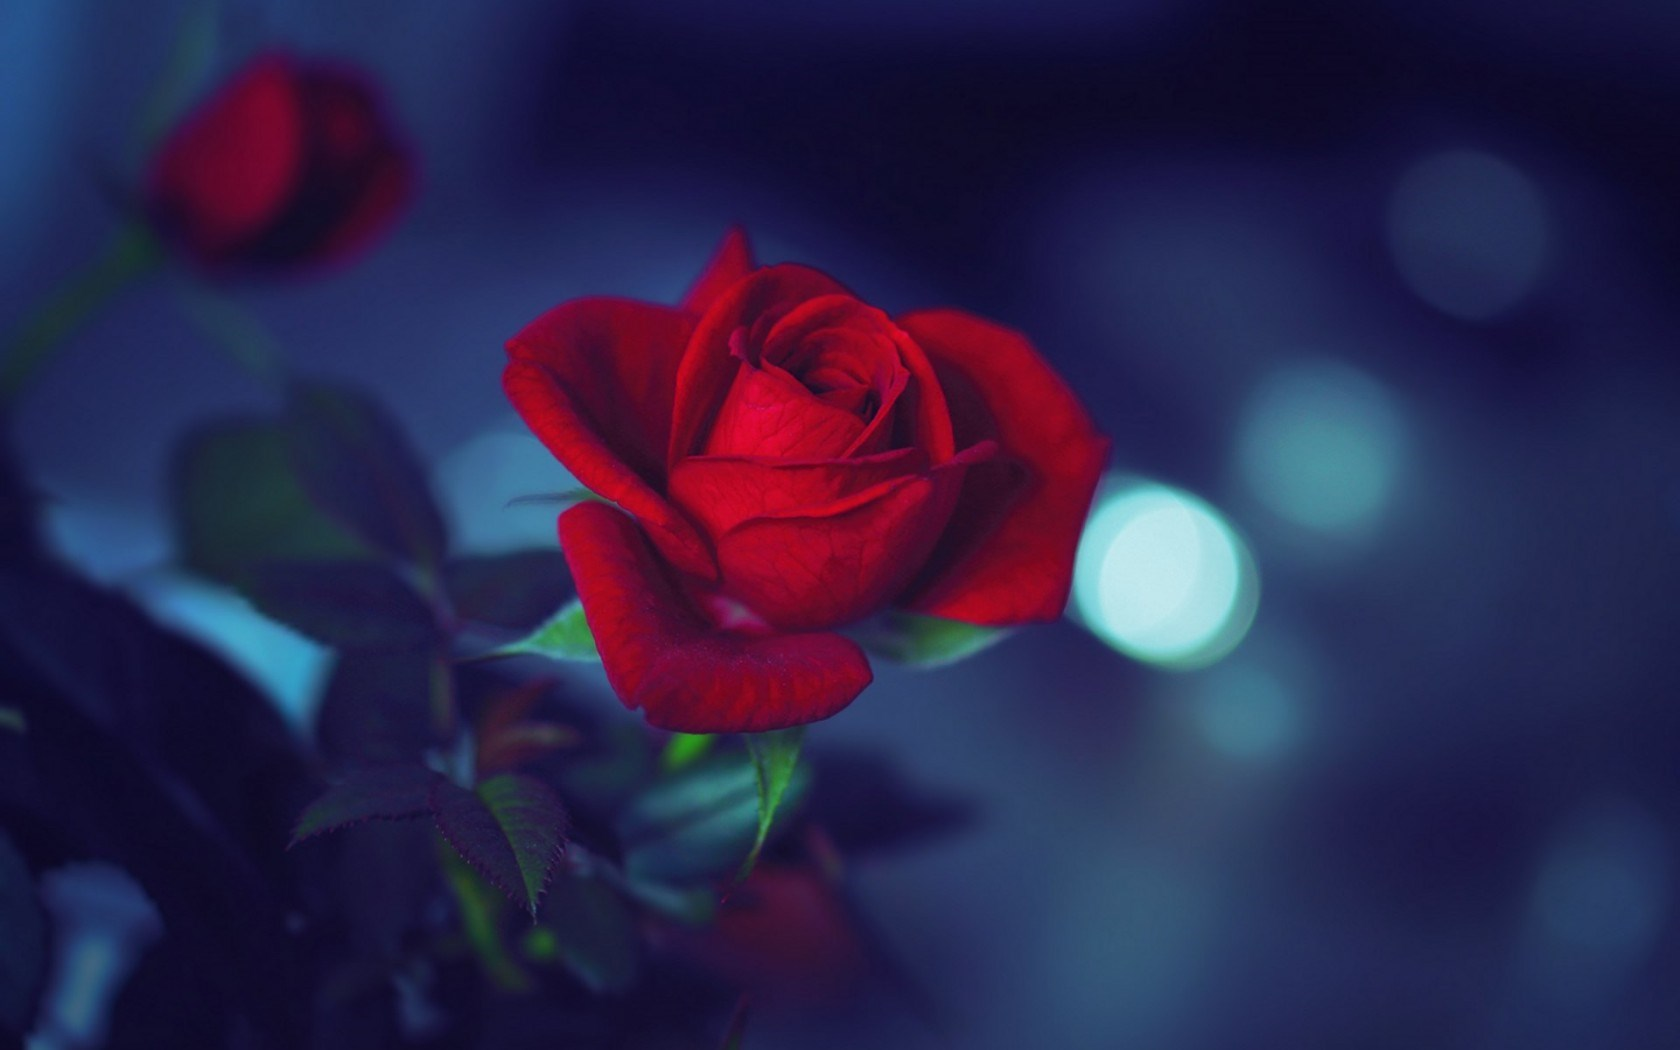 rose red wallpaper